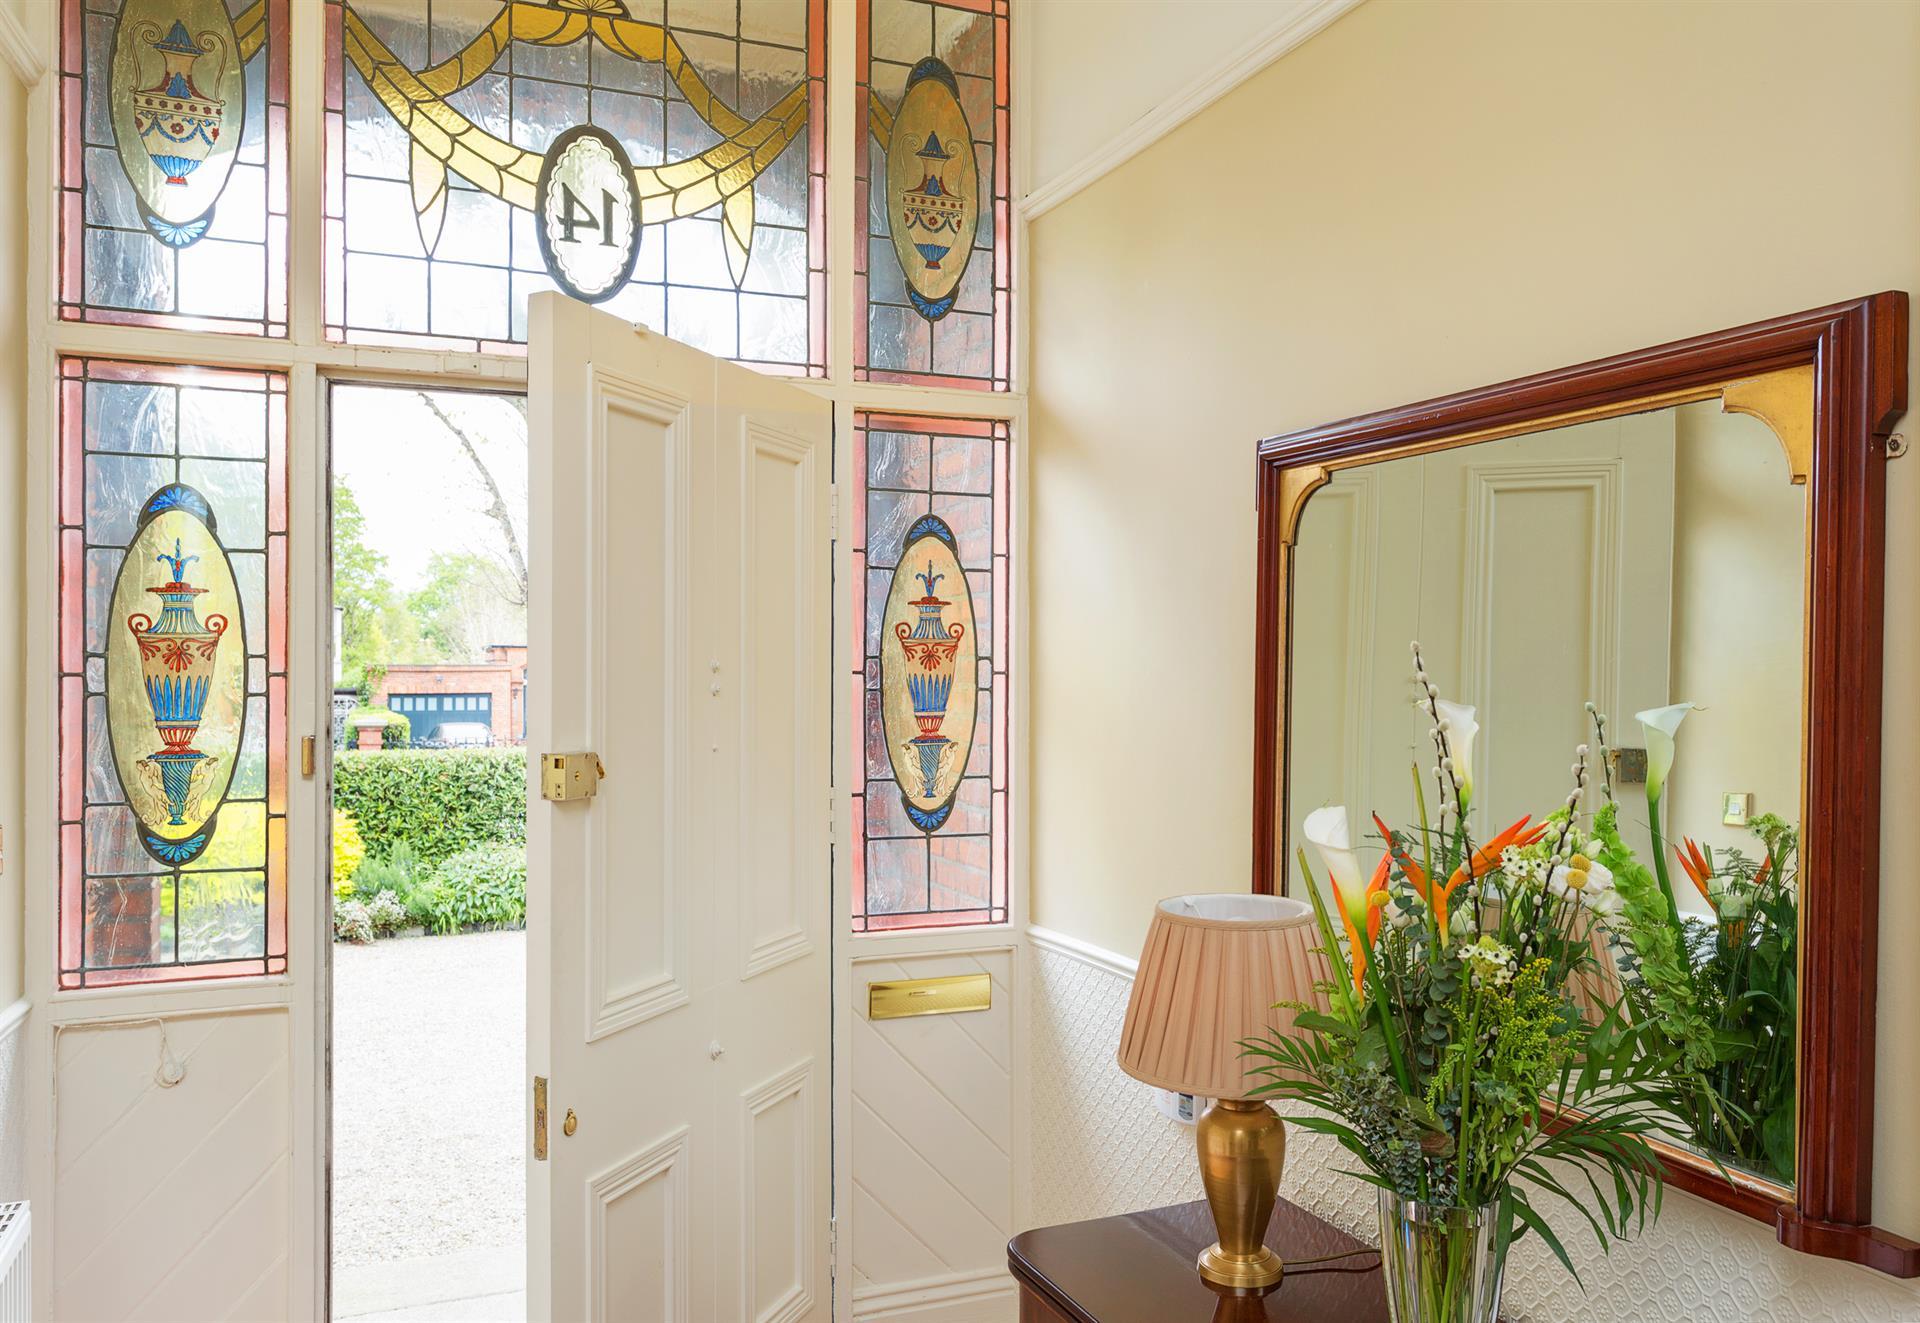 14 Temple Villas, Rathmines, Dublin 6: a luxury home for sale in ...